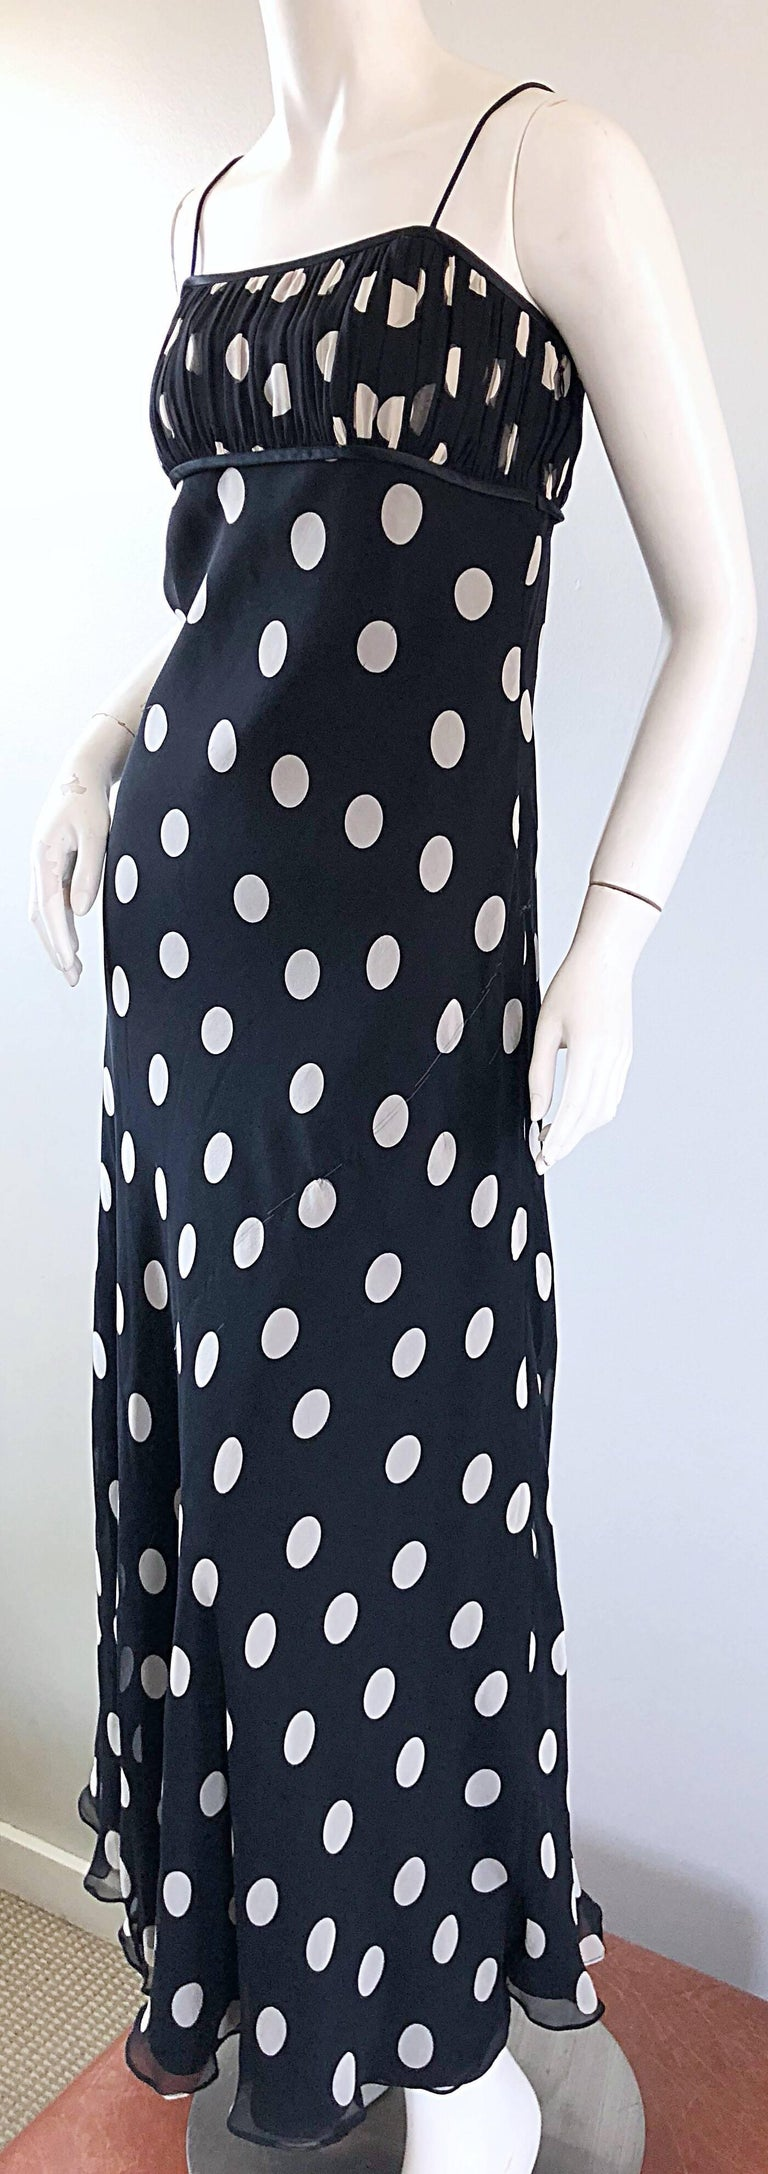 1990s Abriele Melano Black and White Polka Dot Silk Chiffon Maxi Dress 90s Gown For Sale 3